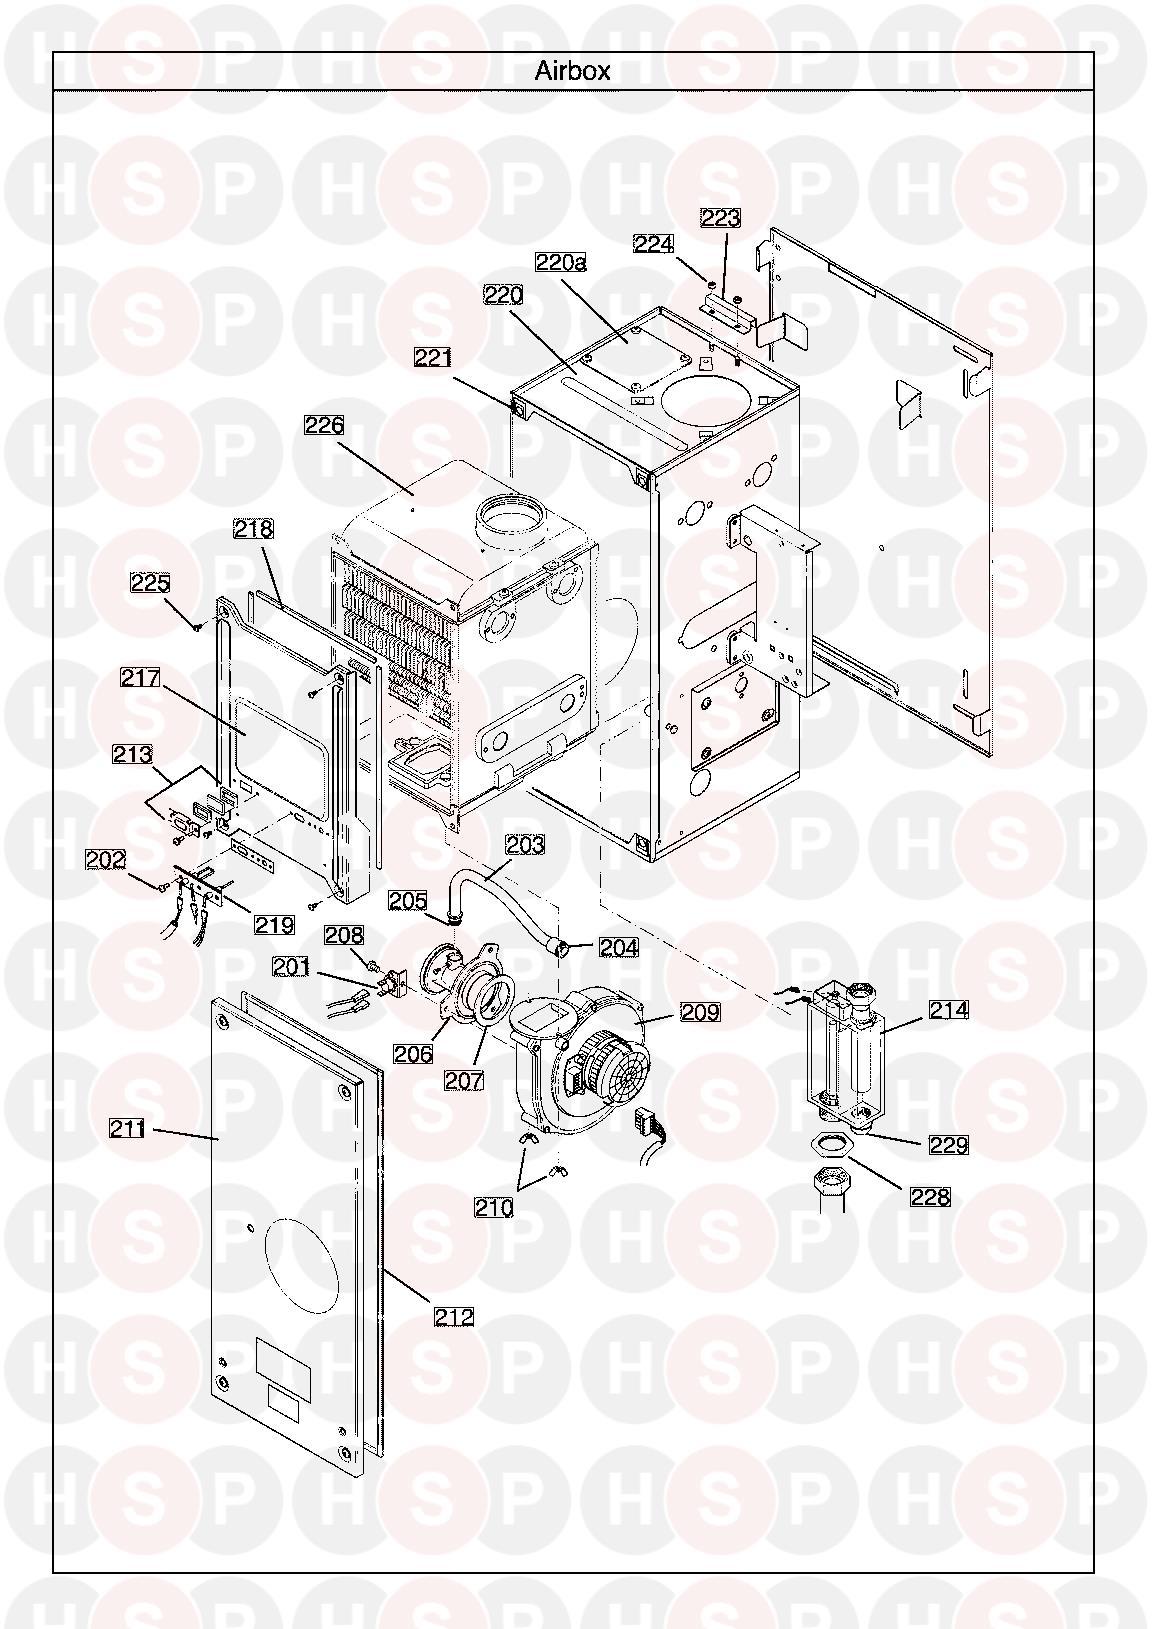 main 24 heat only erp serial no  ending in ac  air box